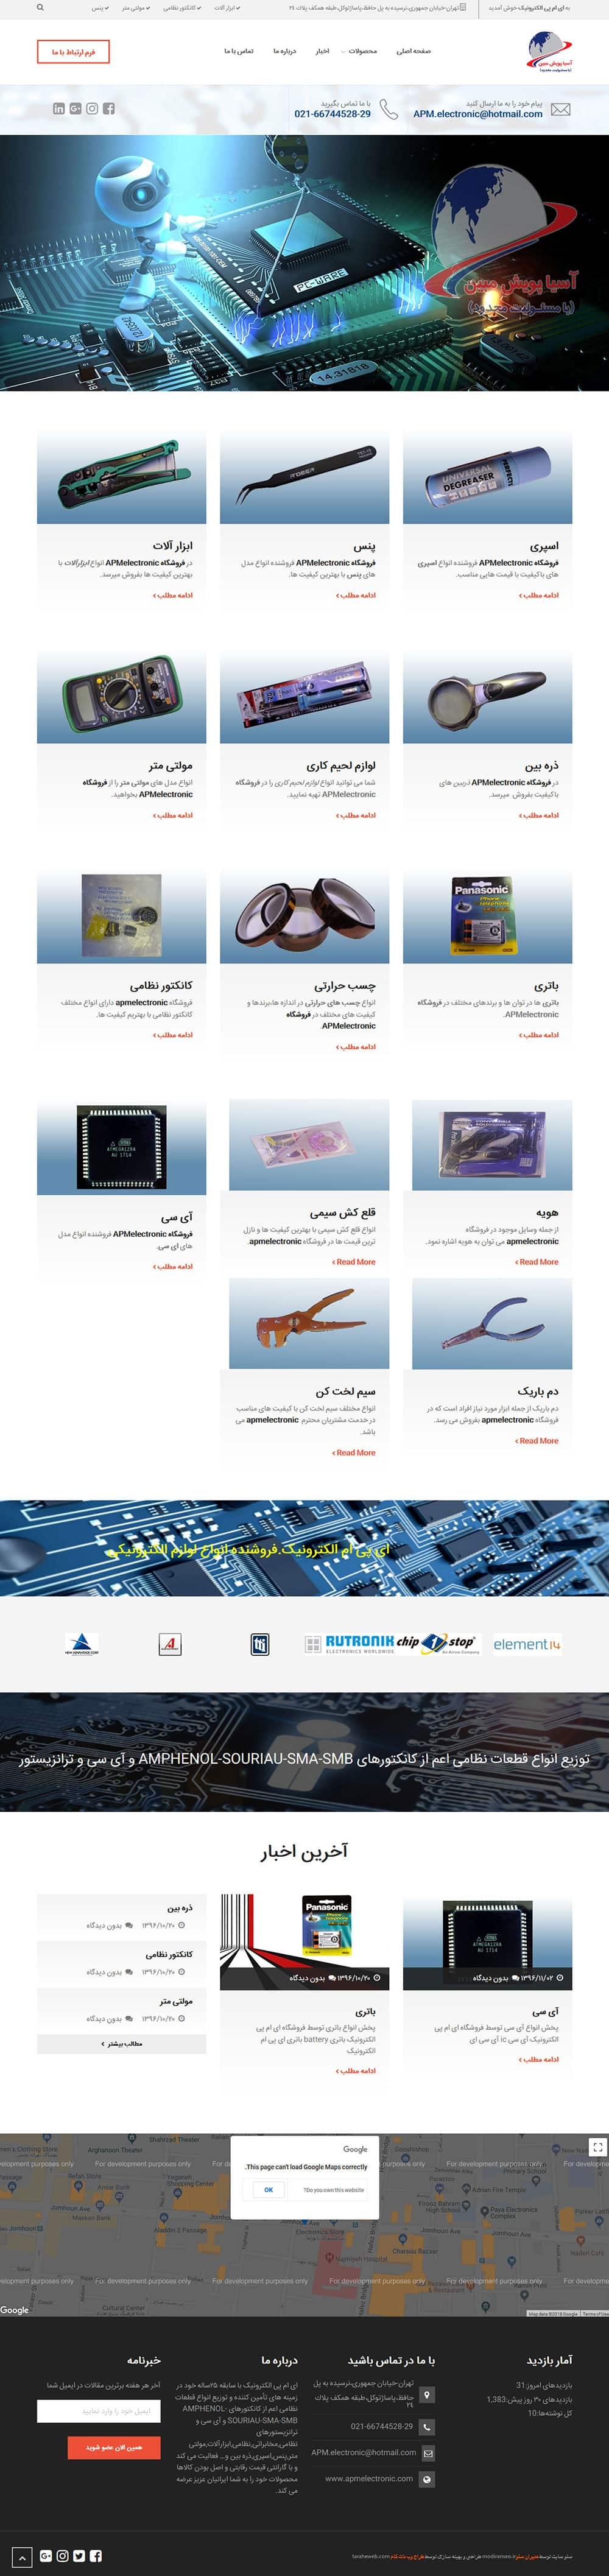 طراحی سایت ای پی ام الکترونیک